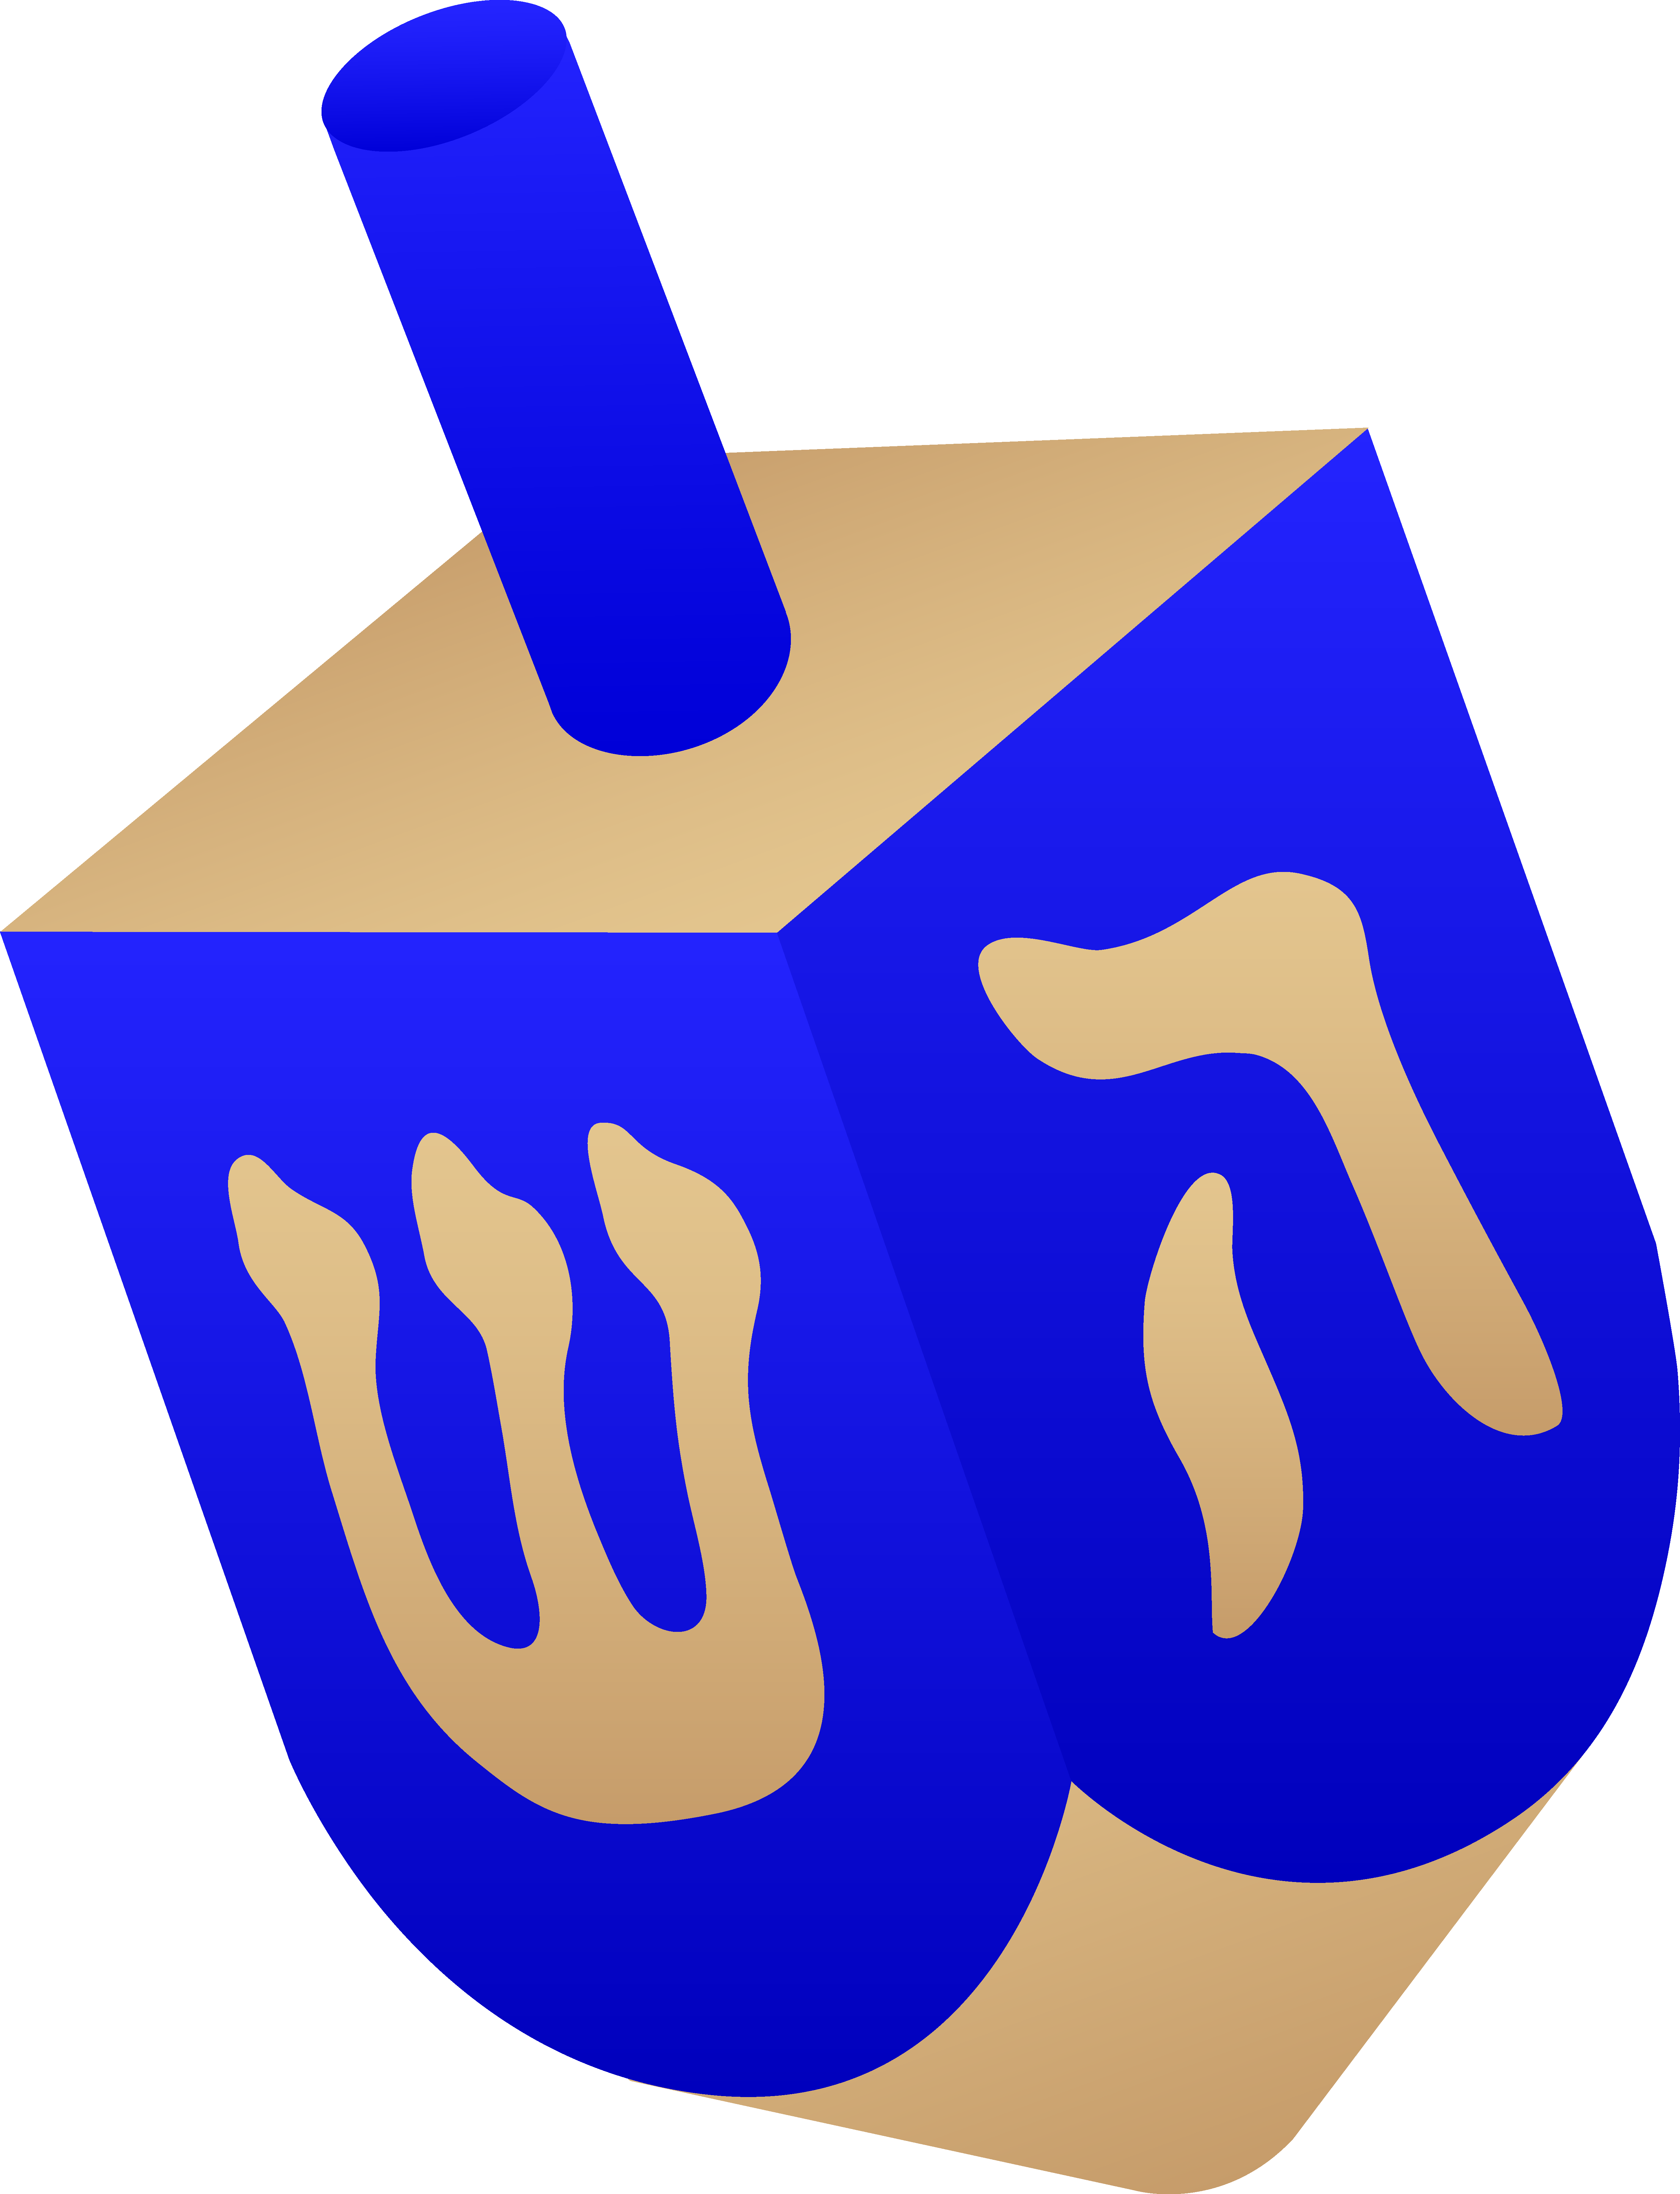 5319x6947 Hanukkah Clipart Hanukkah Clipart